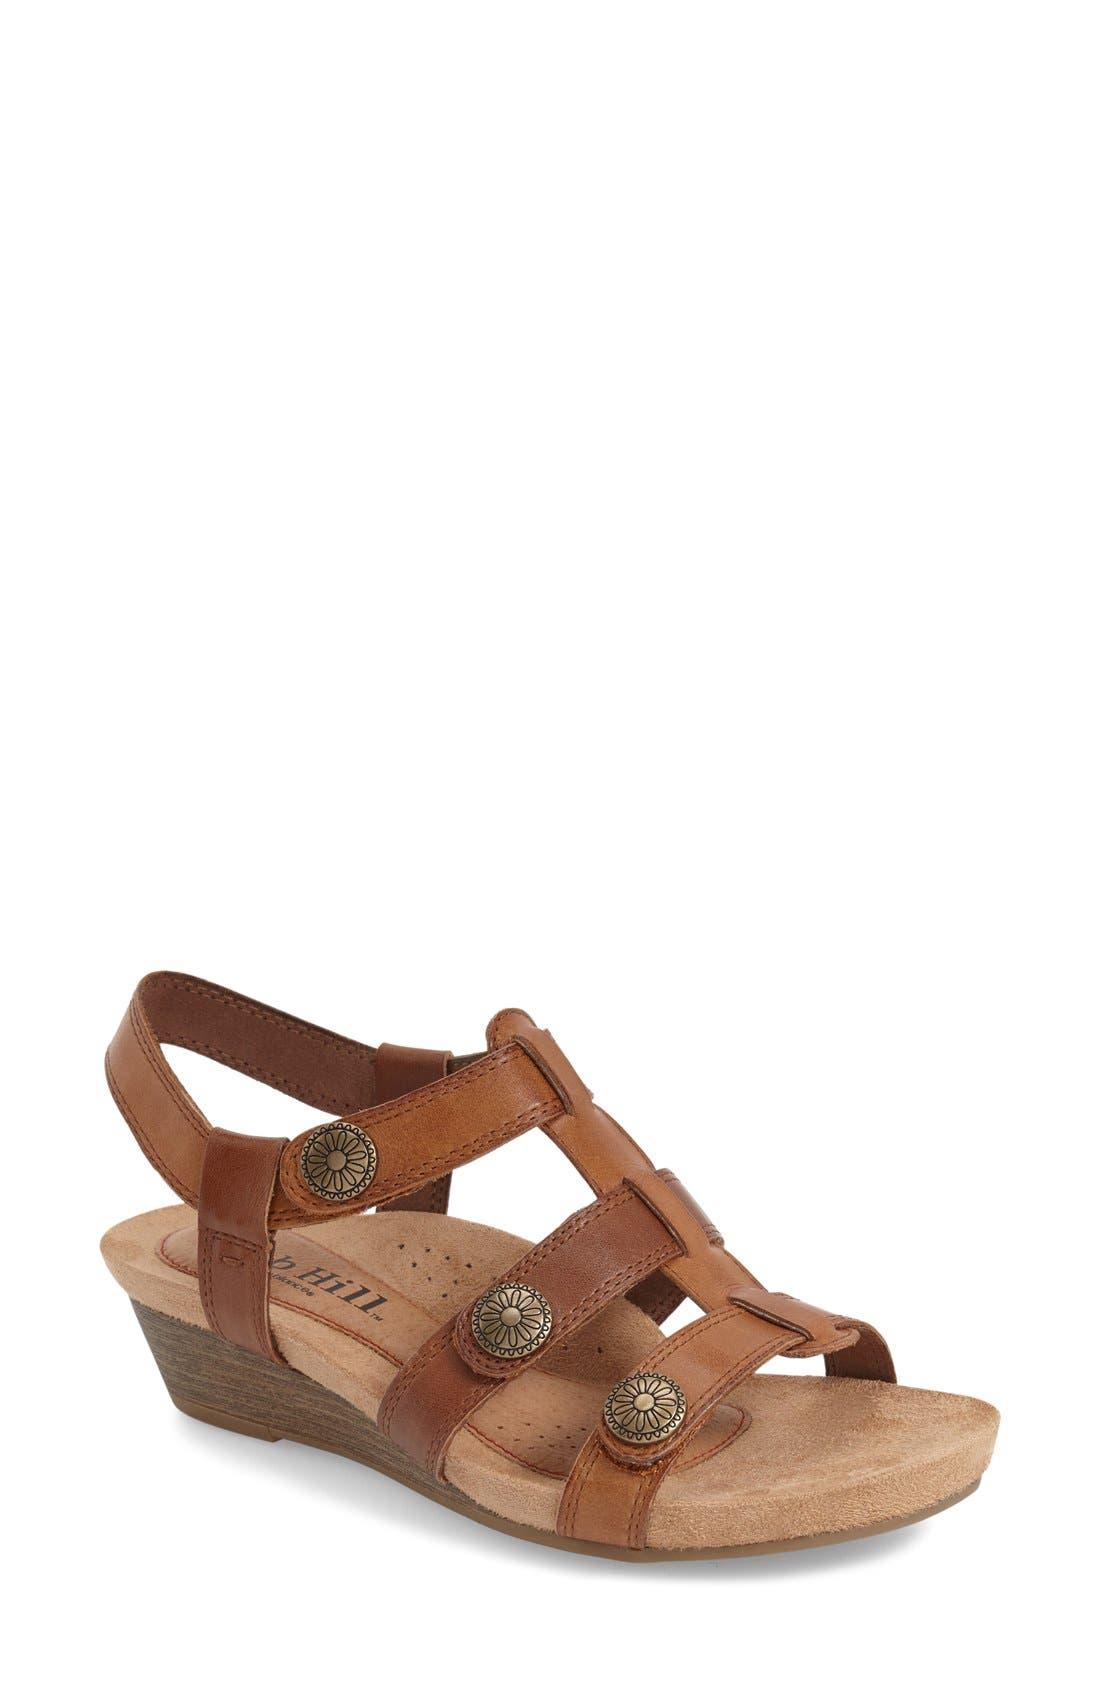 Alternate Image 1 Selected - Rockport Cobb Hill 'Harper' Wedge Sandal (Women)